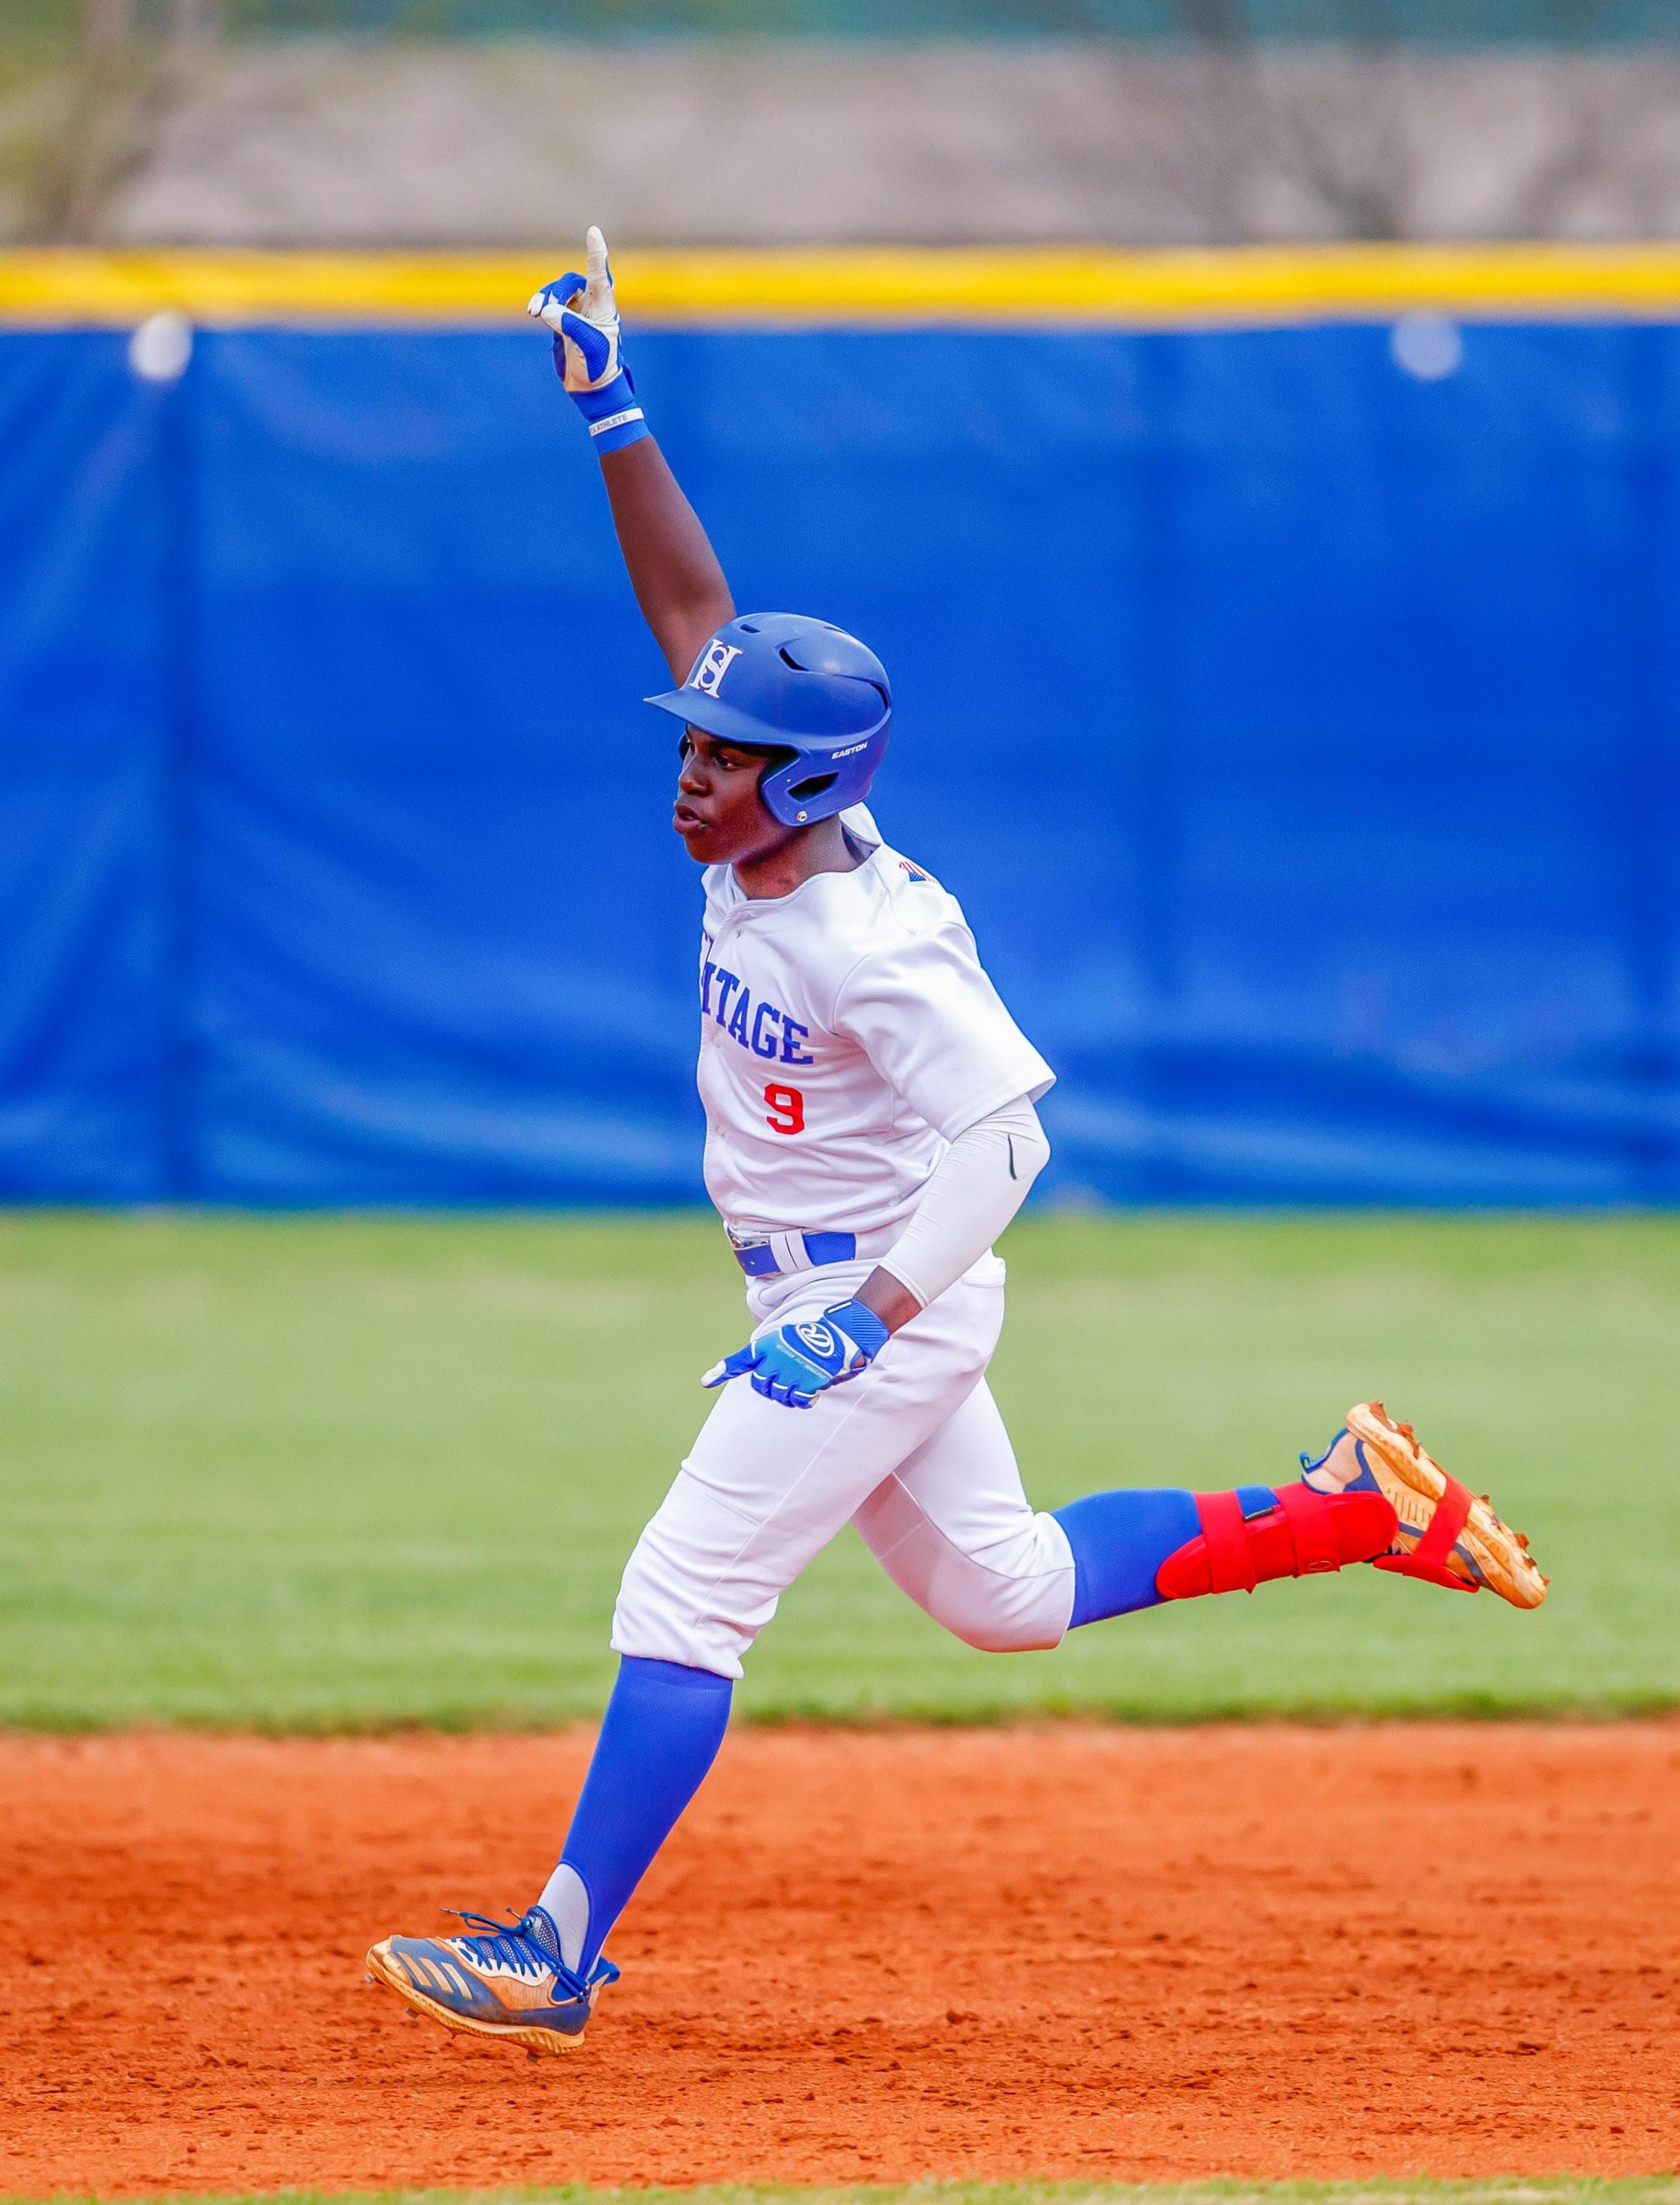 03-30-21-Varsity-Baseball-Heritage-vs-Trinity-3015.jpg?mtime=20210401181019#asset:60048